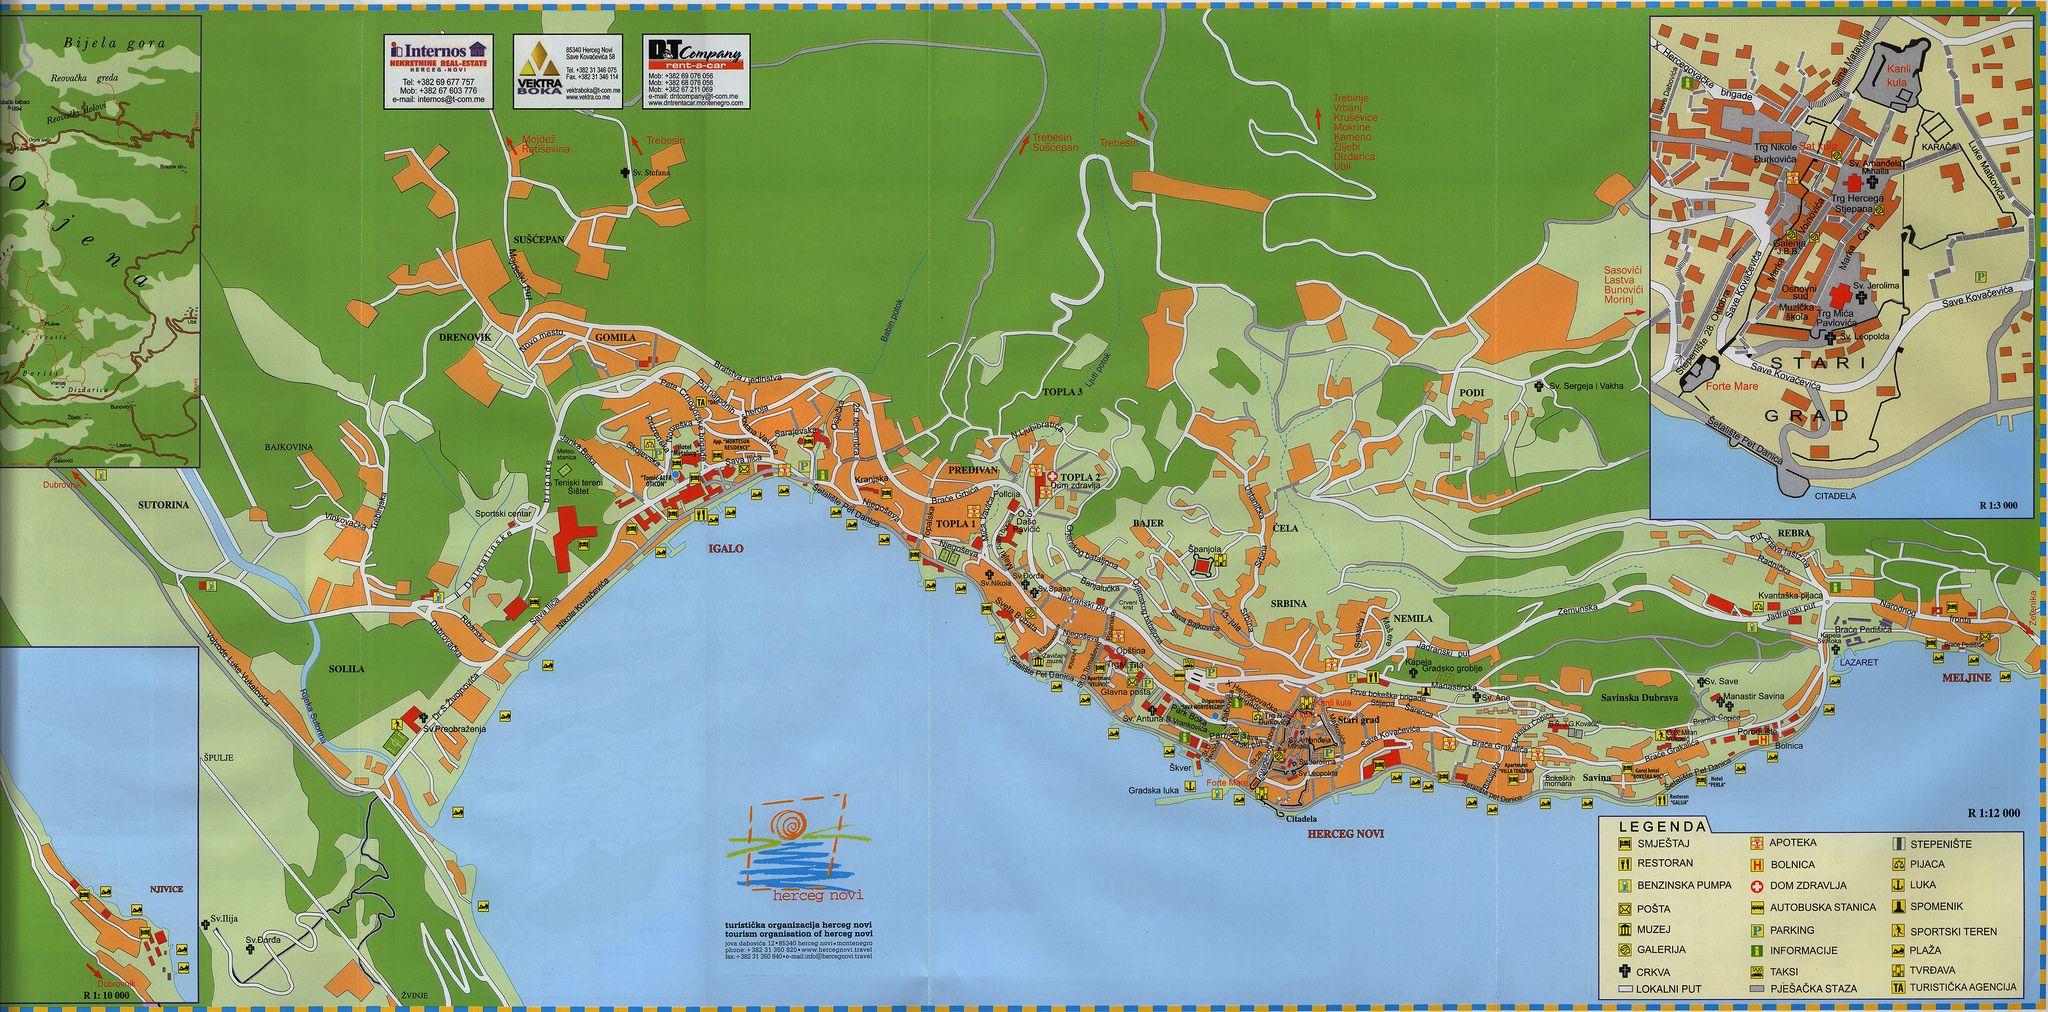 herceg novi mapa herceg novi mapa grada/ city map; 2014_2, Montenegro | Pinterest  herceg novi mapa